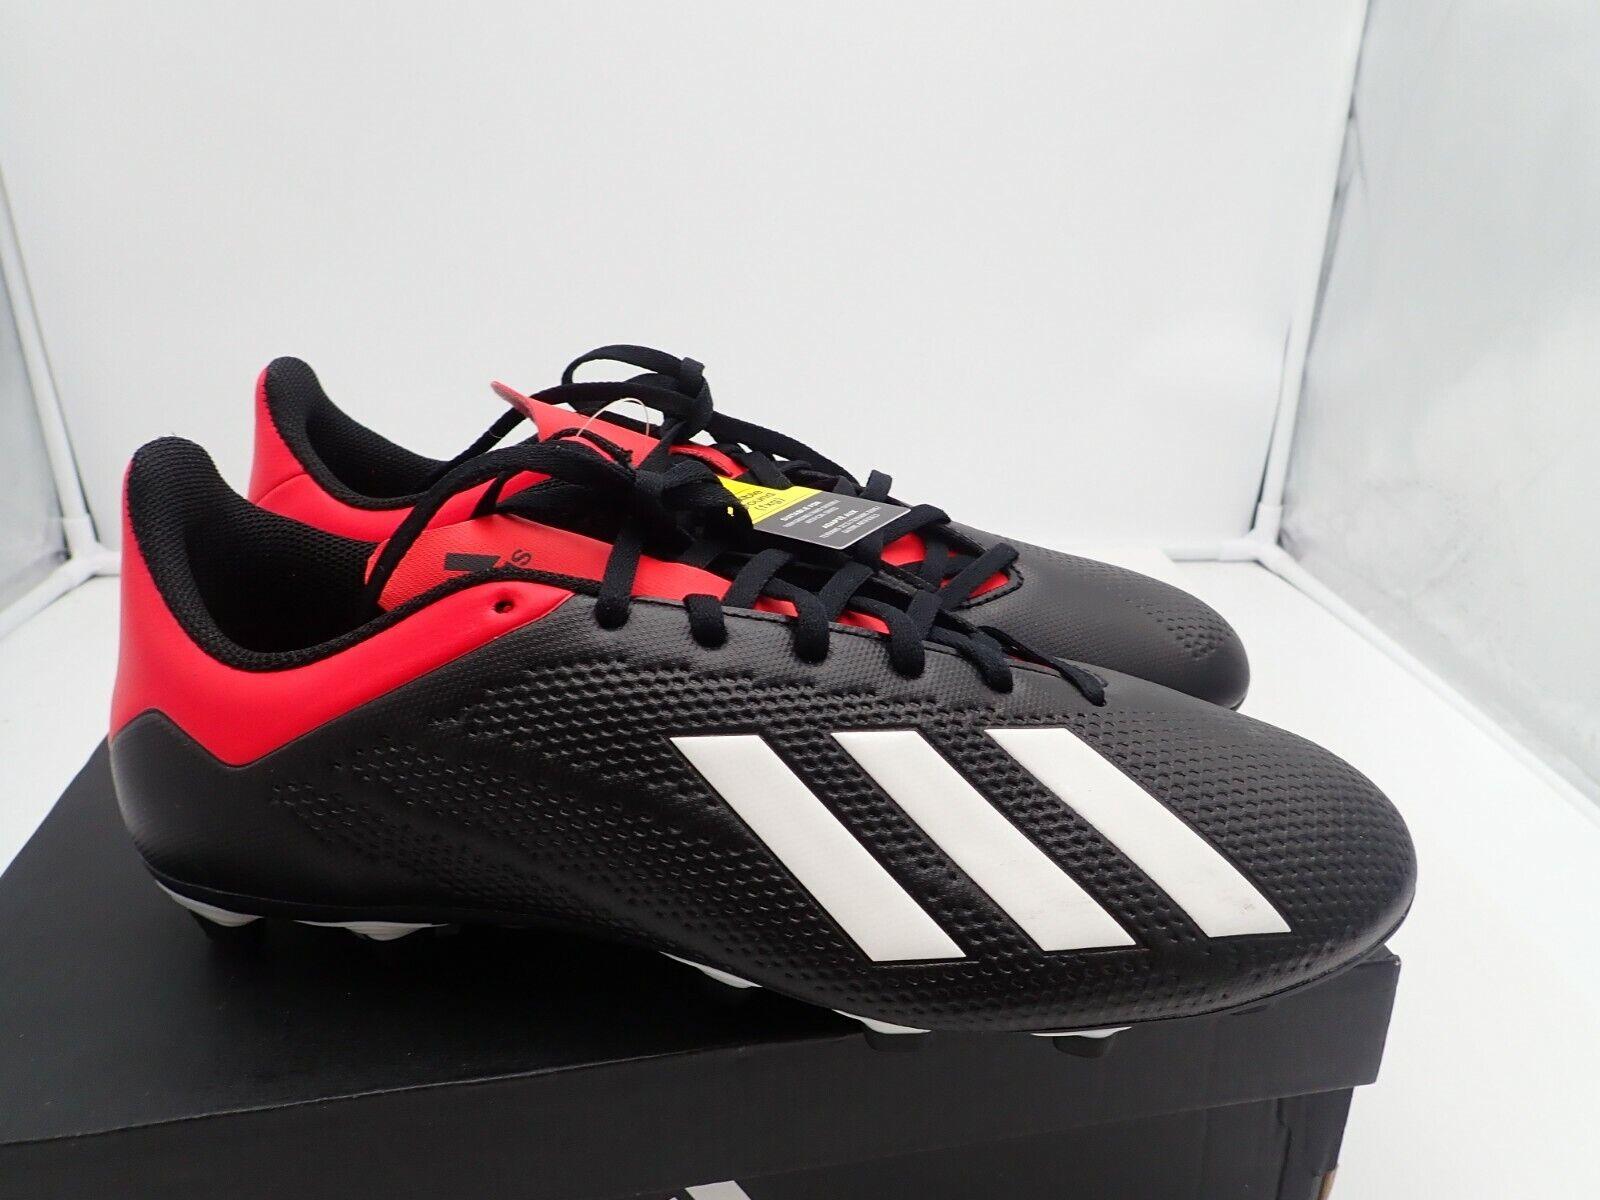 X 18.4 Firm Ground soccer shoe, Black